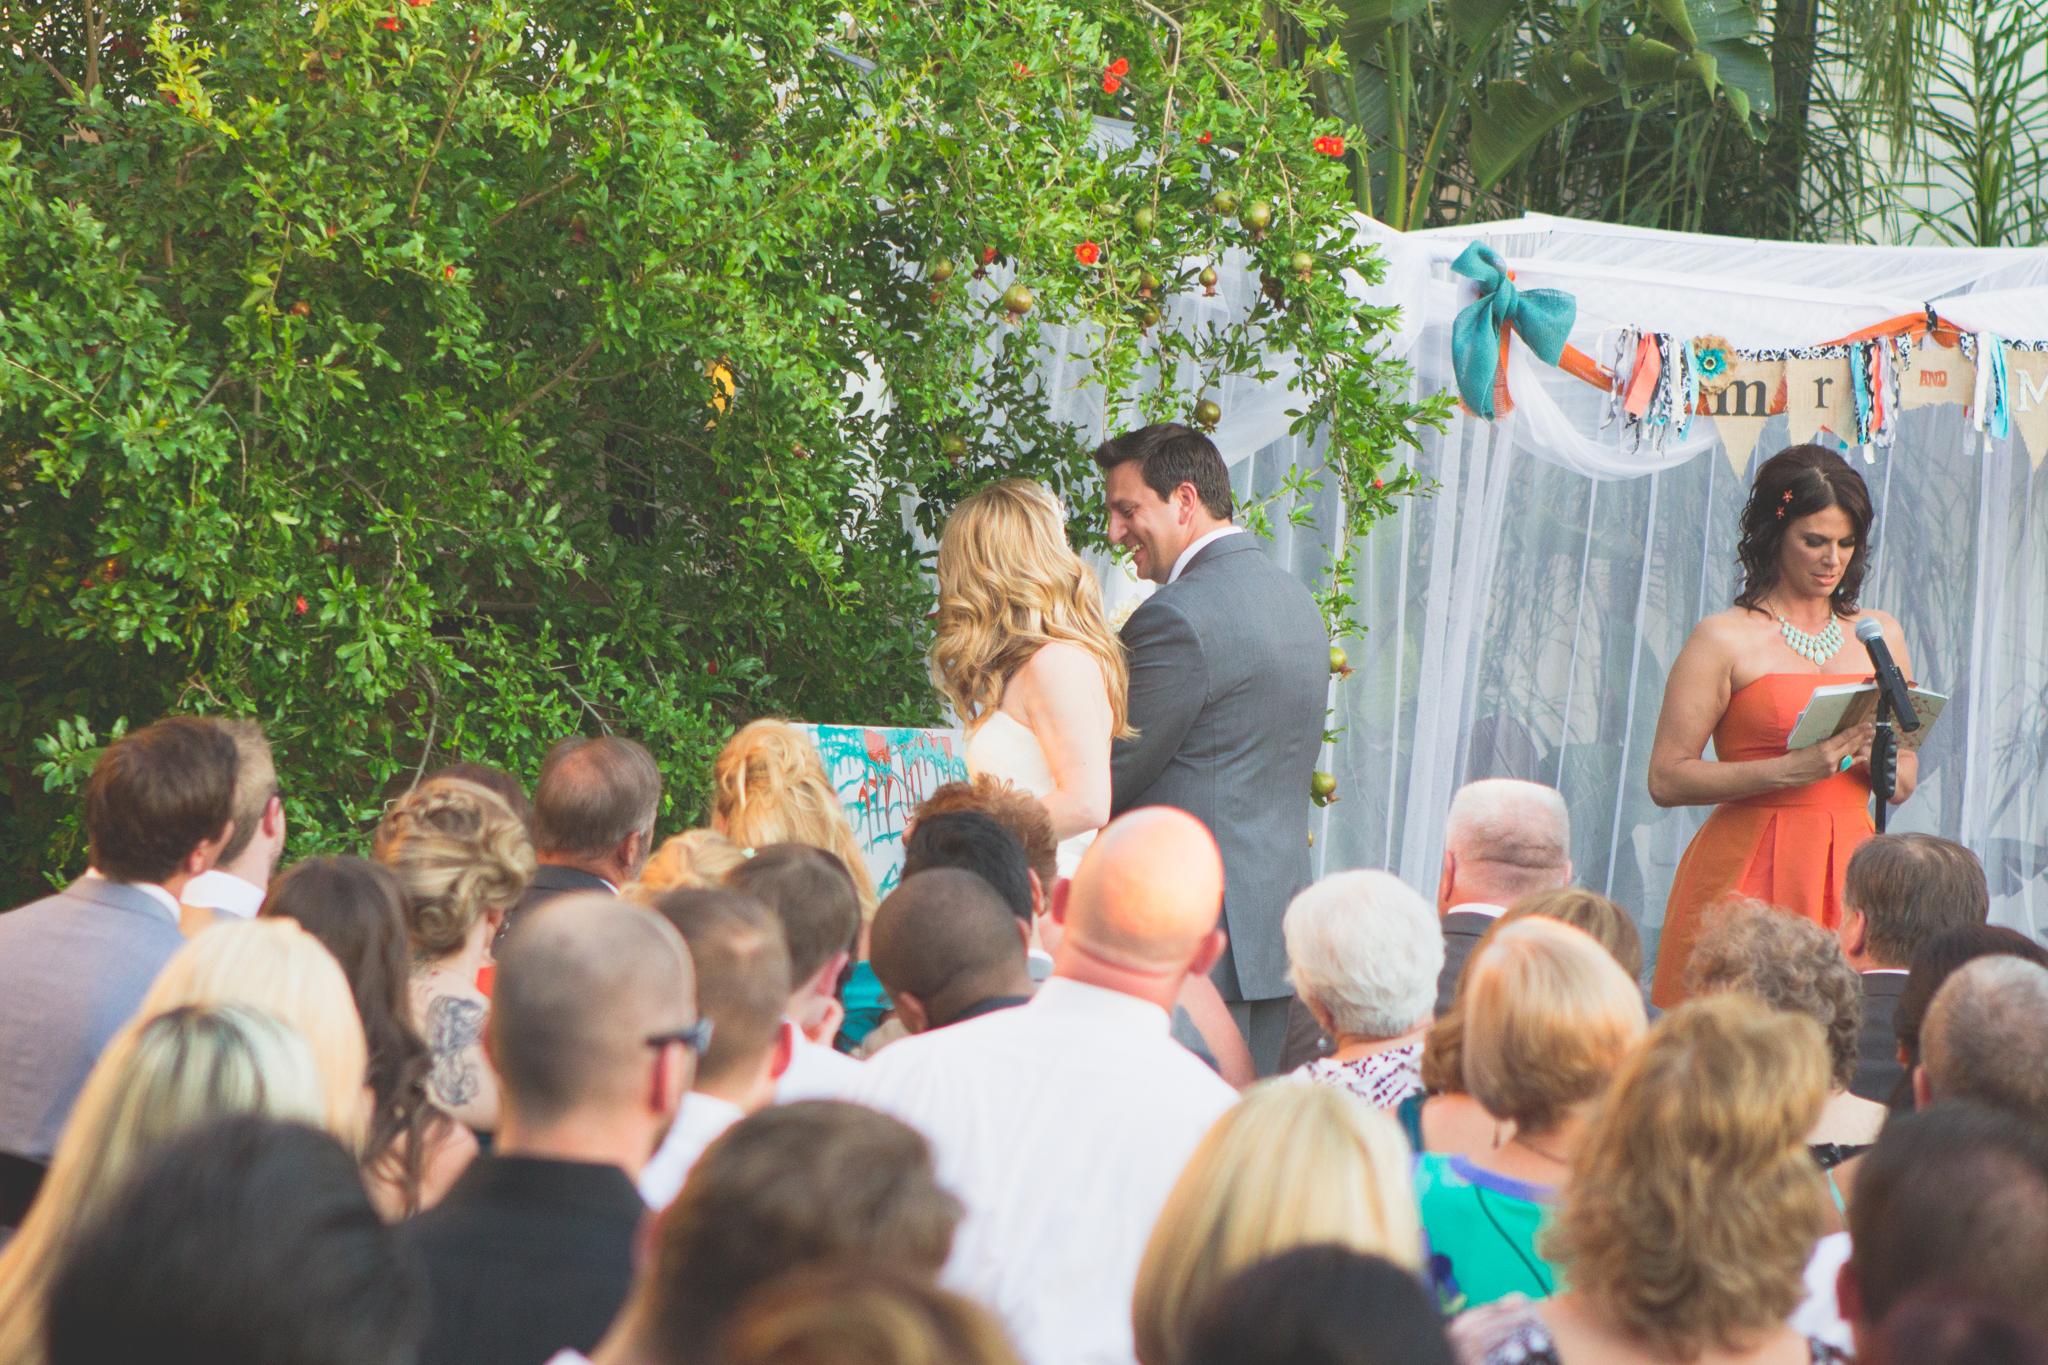 scottsdale-wedding-photograhy-paint-ceremony-cool